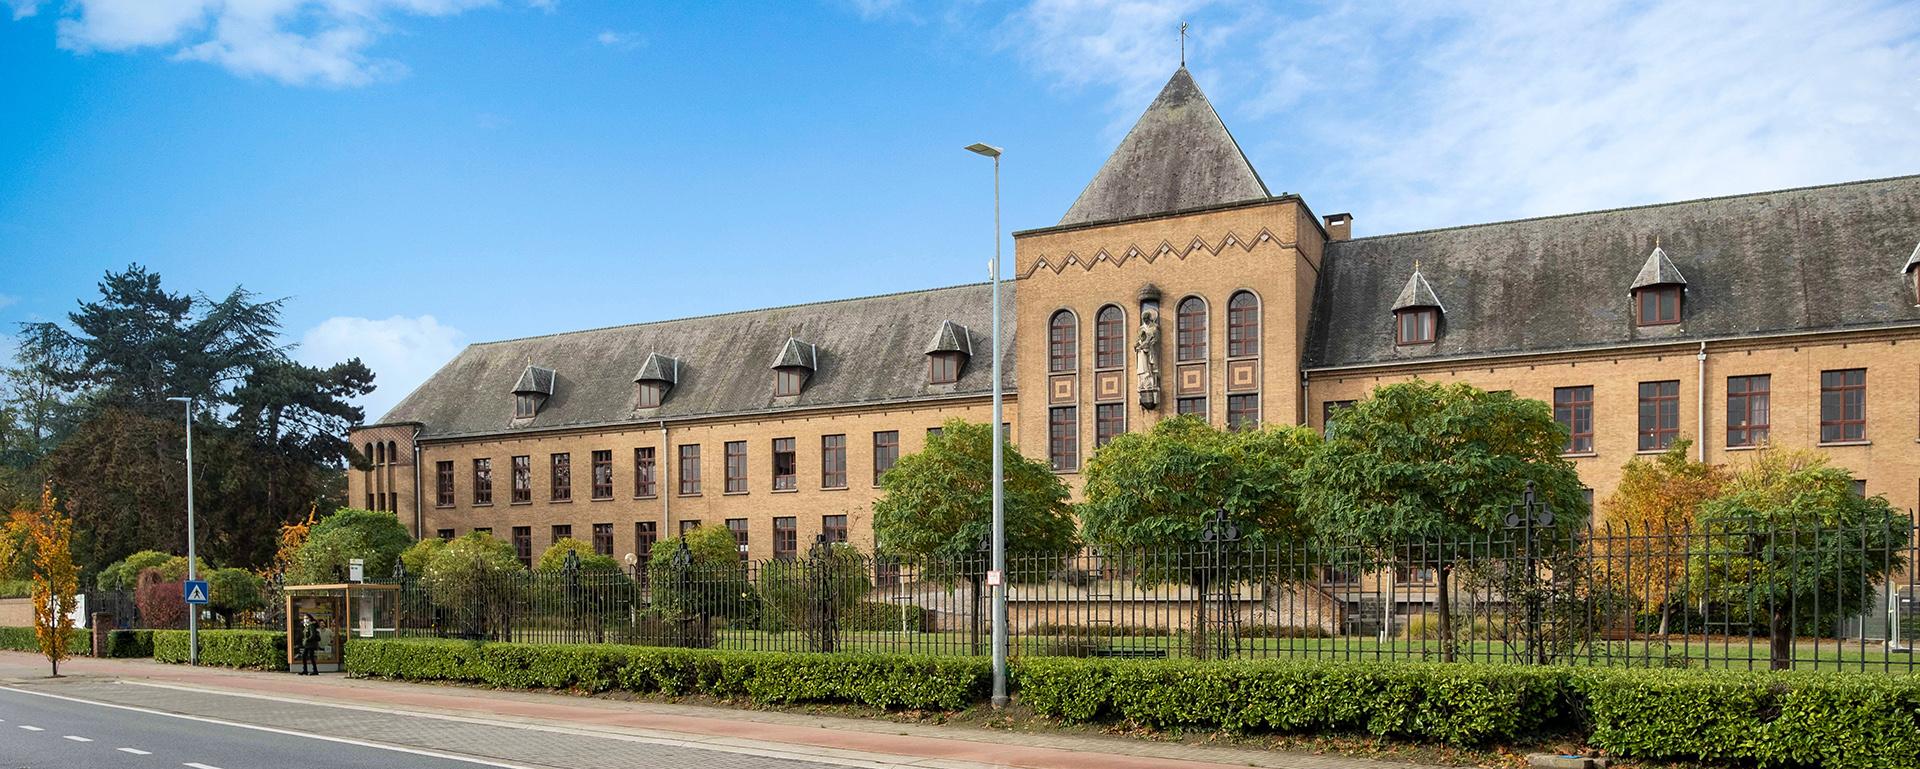 Borgerwijk